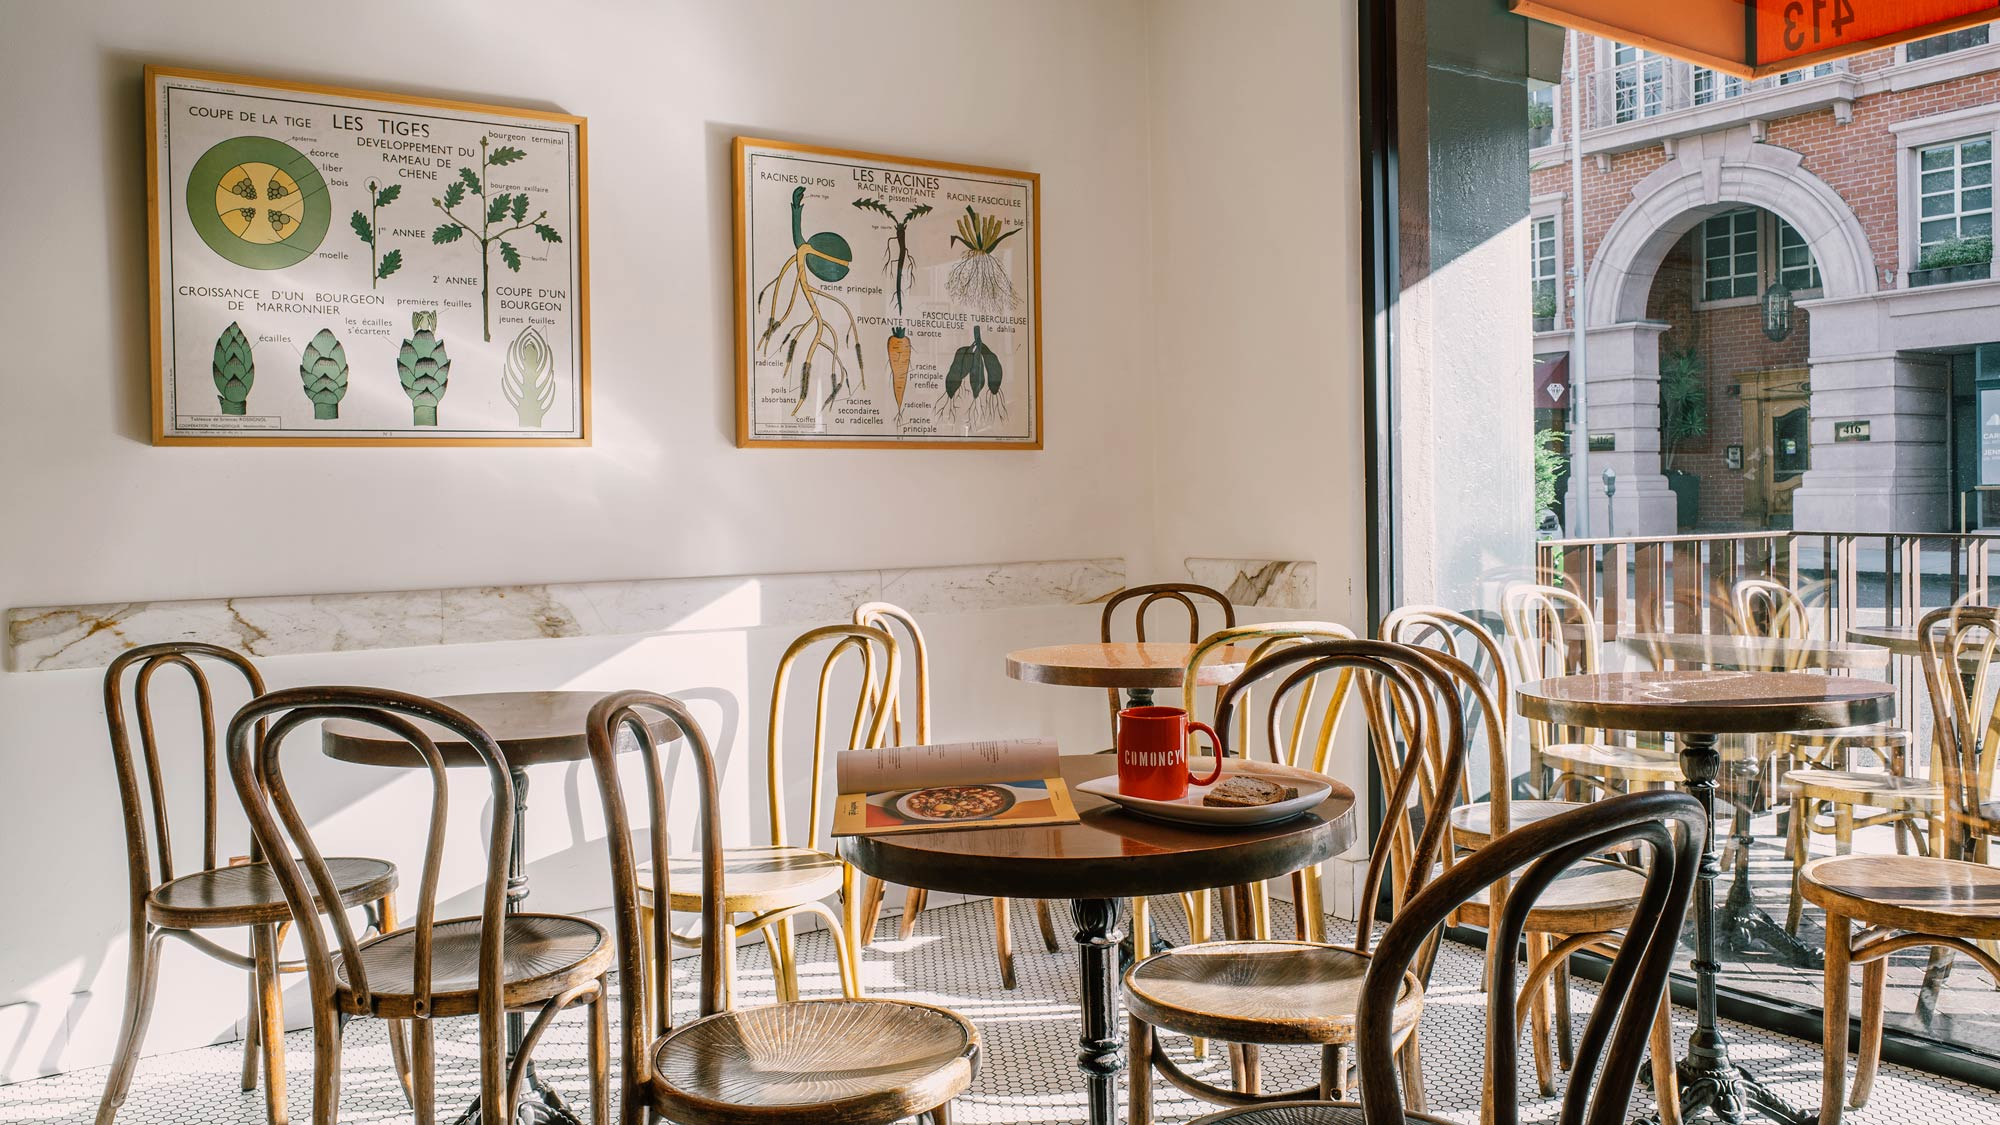 Interior of a Los Angeles cafe